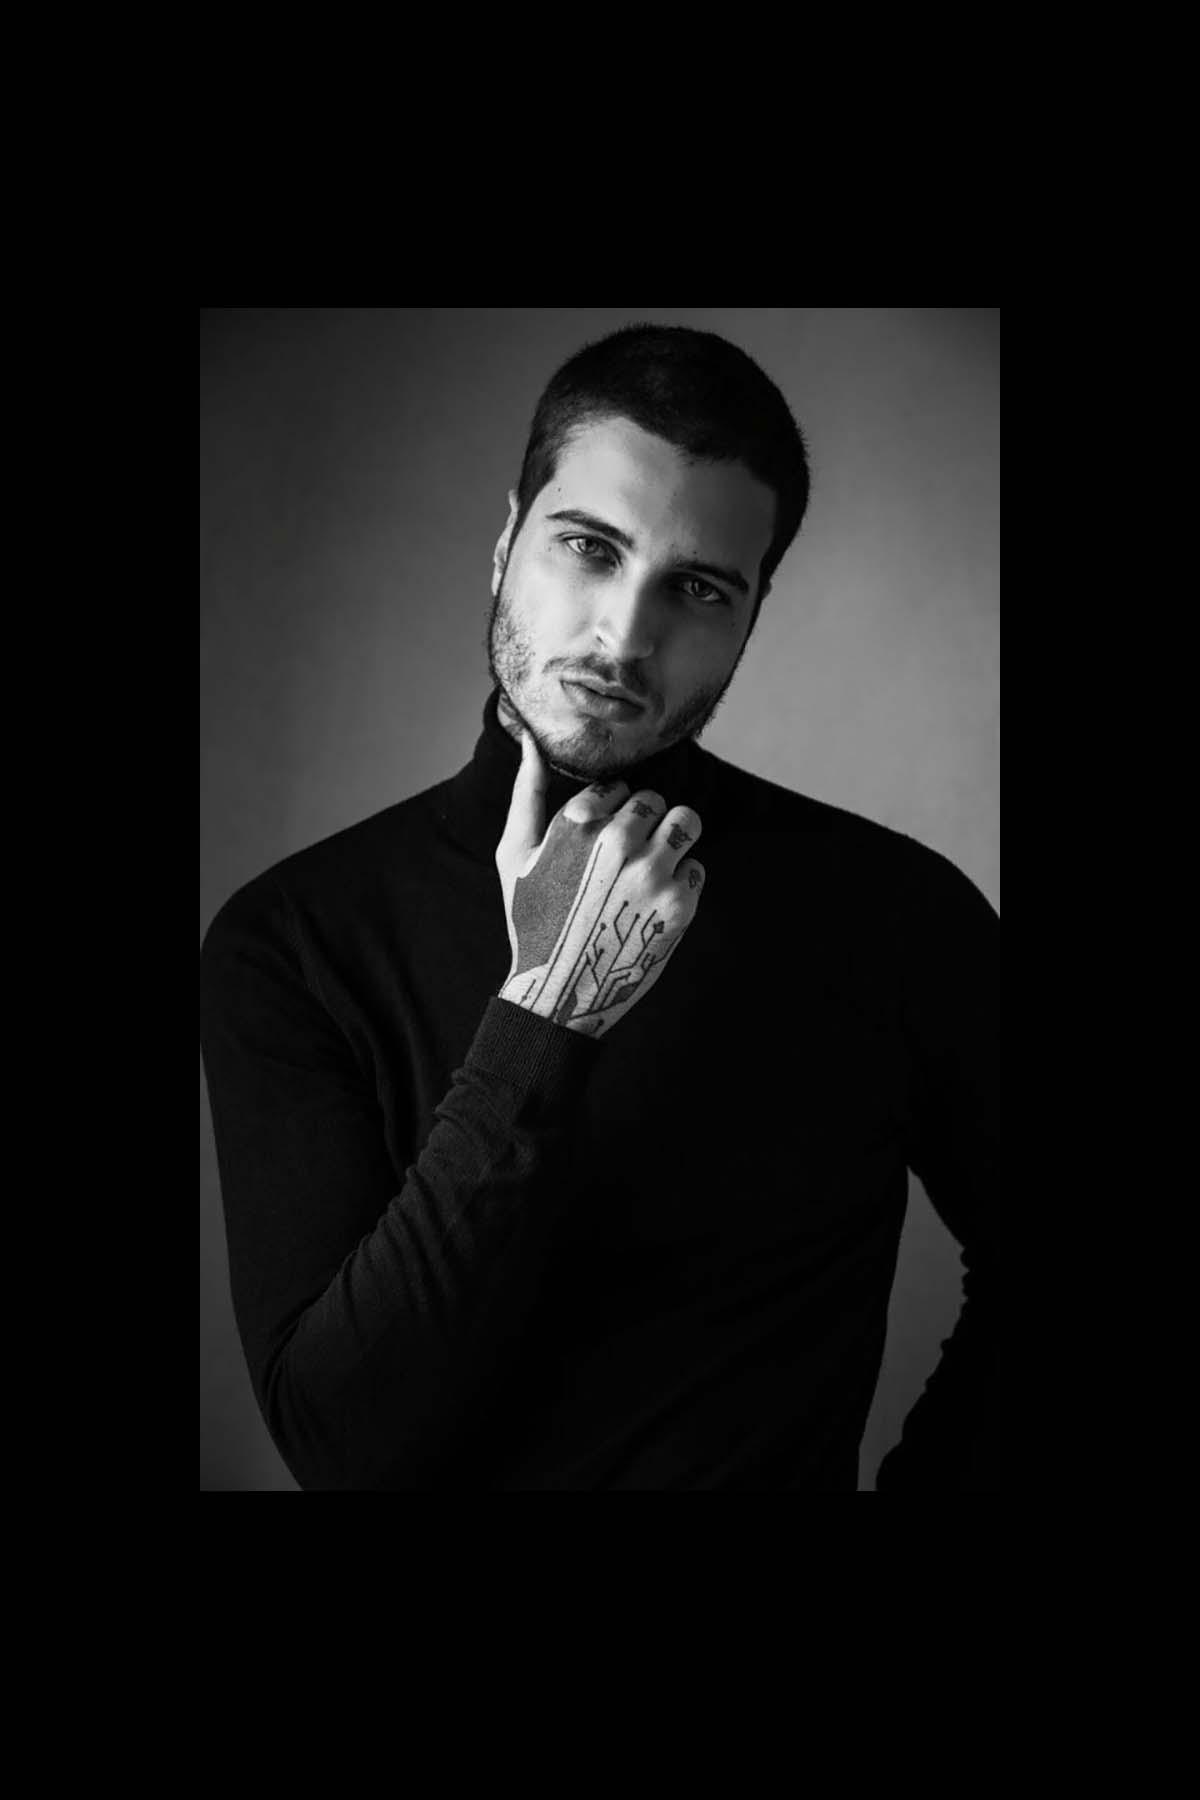 Gustavo Saad by Augusto Carneiro for Brazilian Male Model